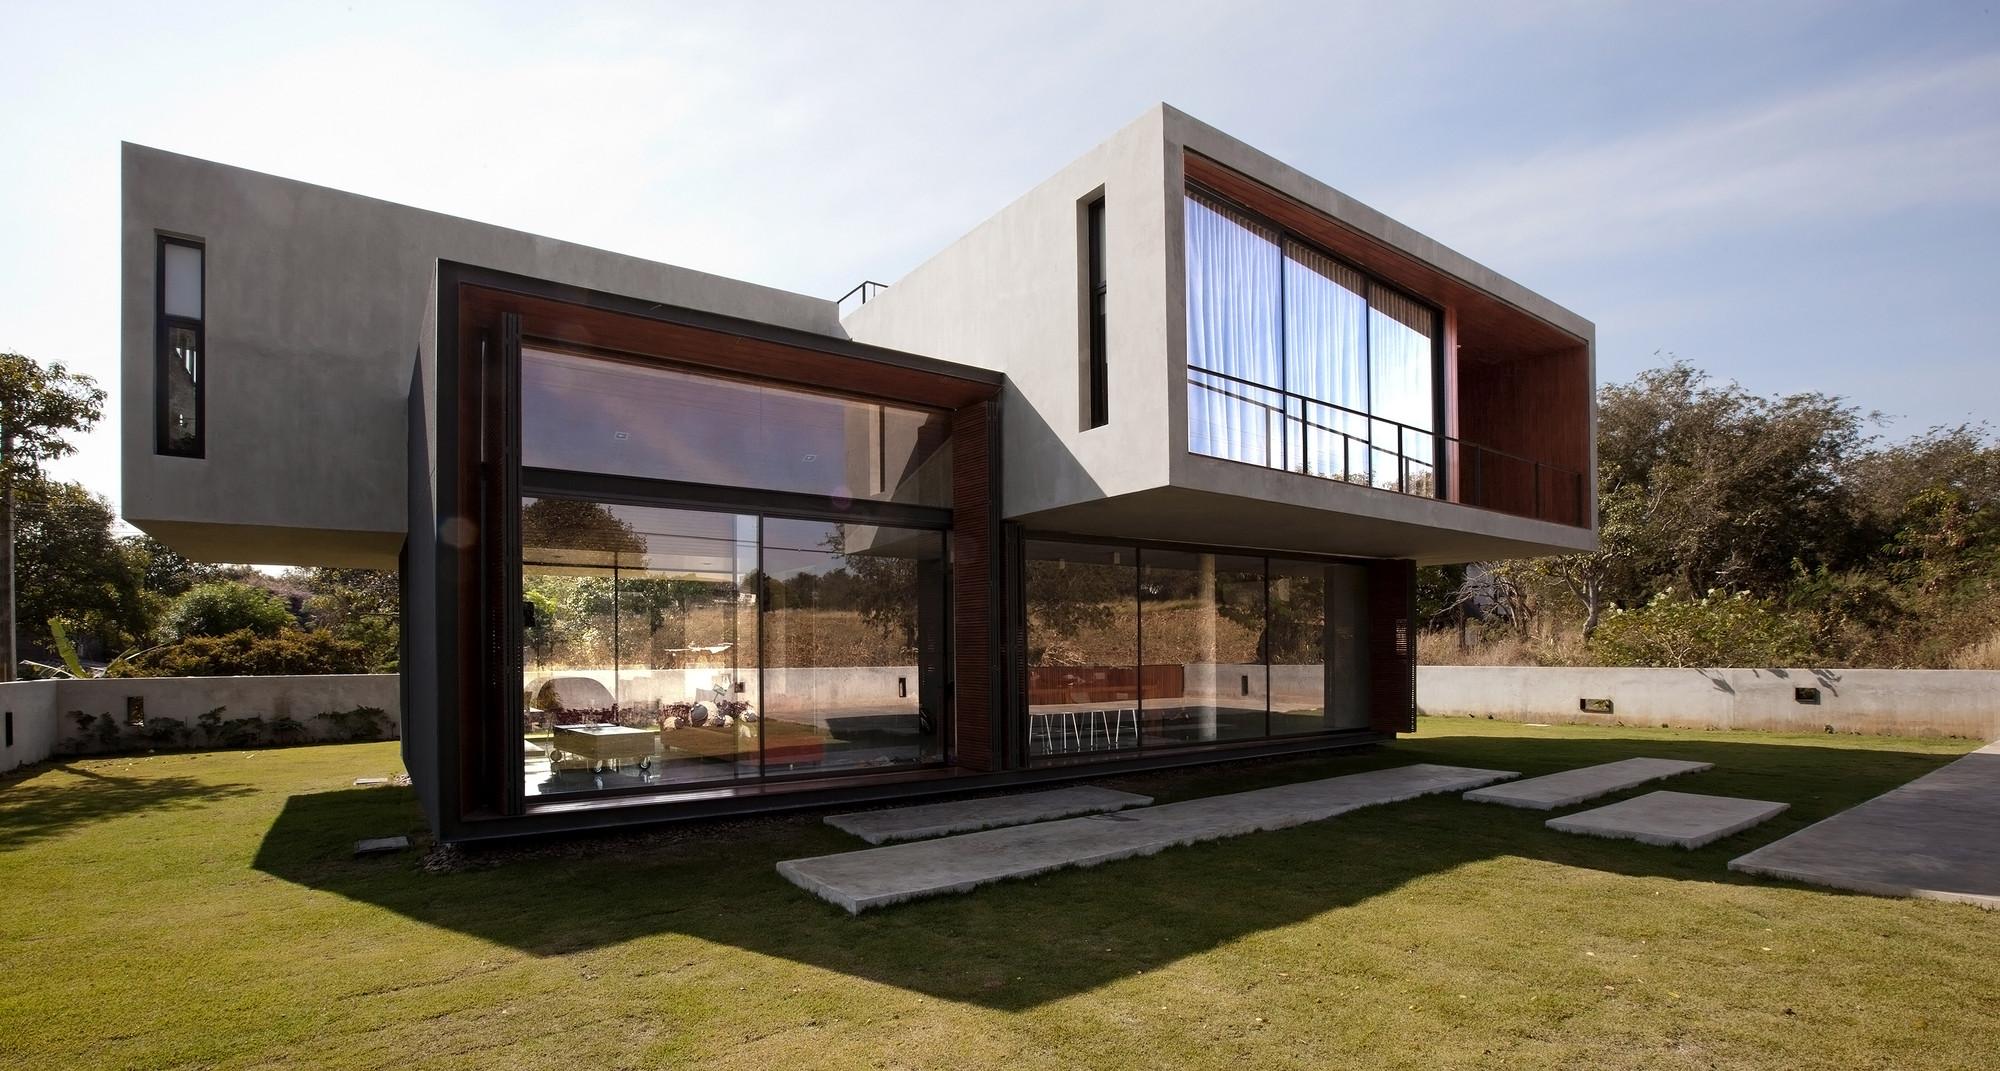 House design thailand - House Design Thailand 51